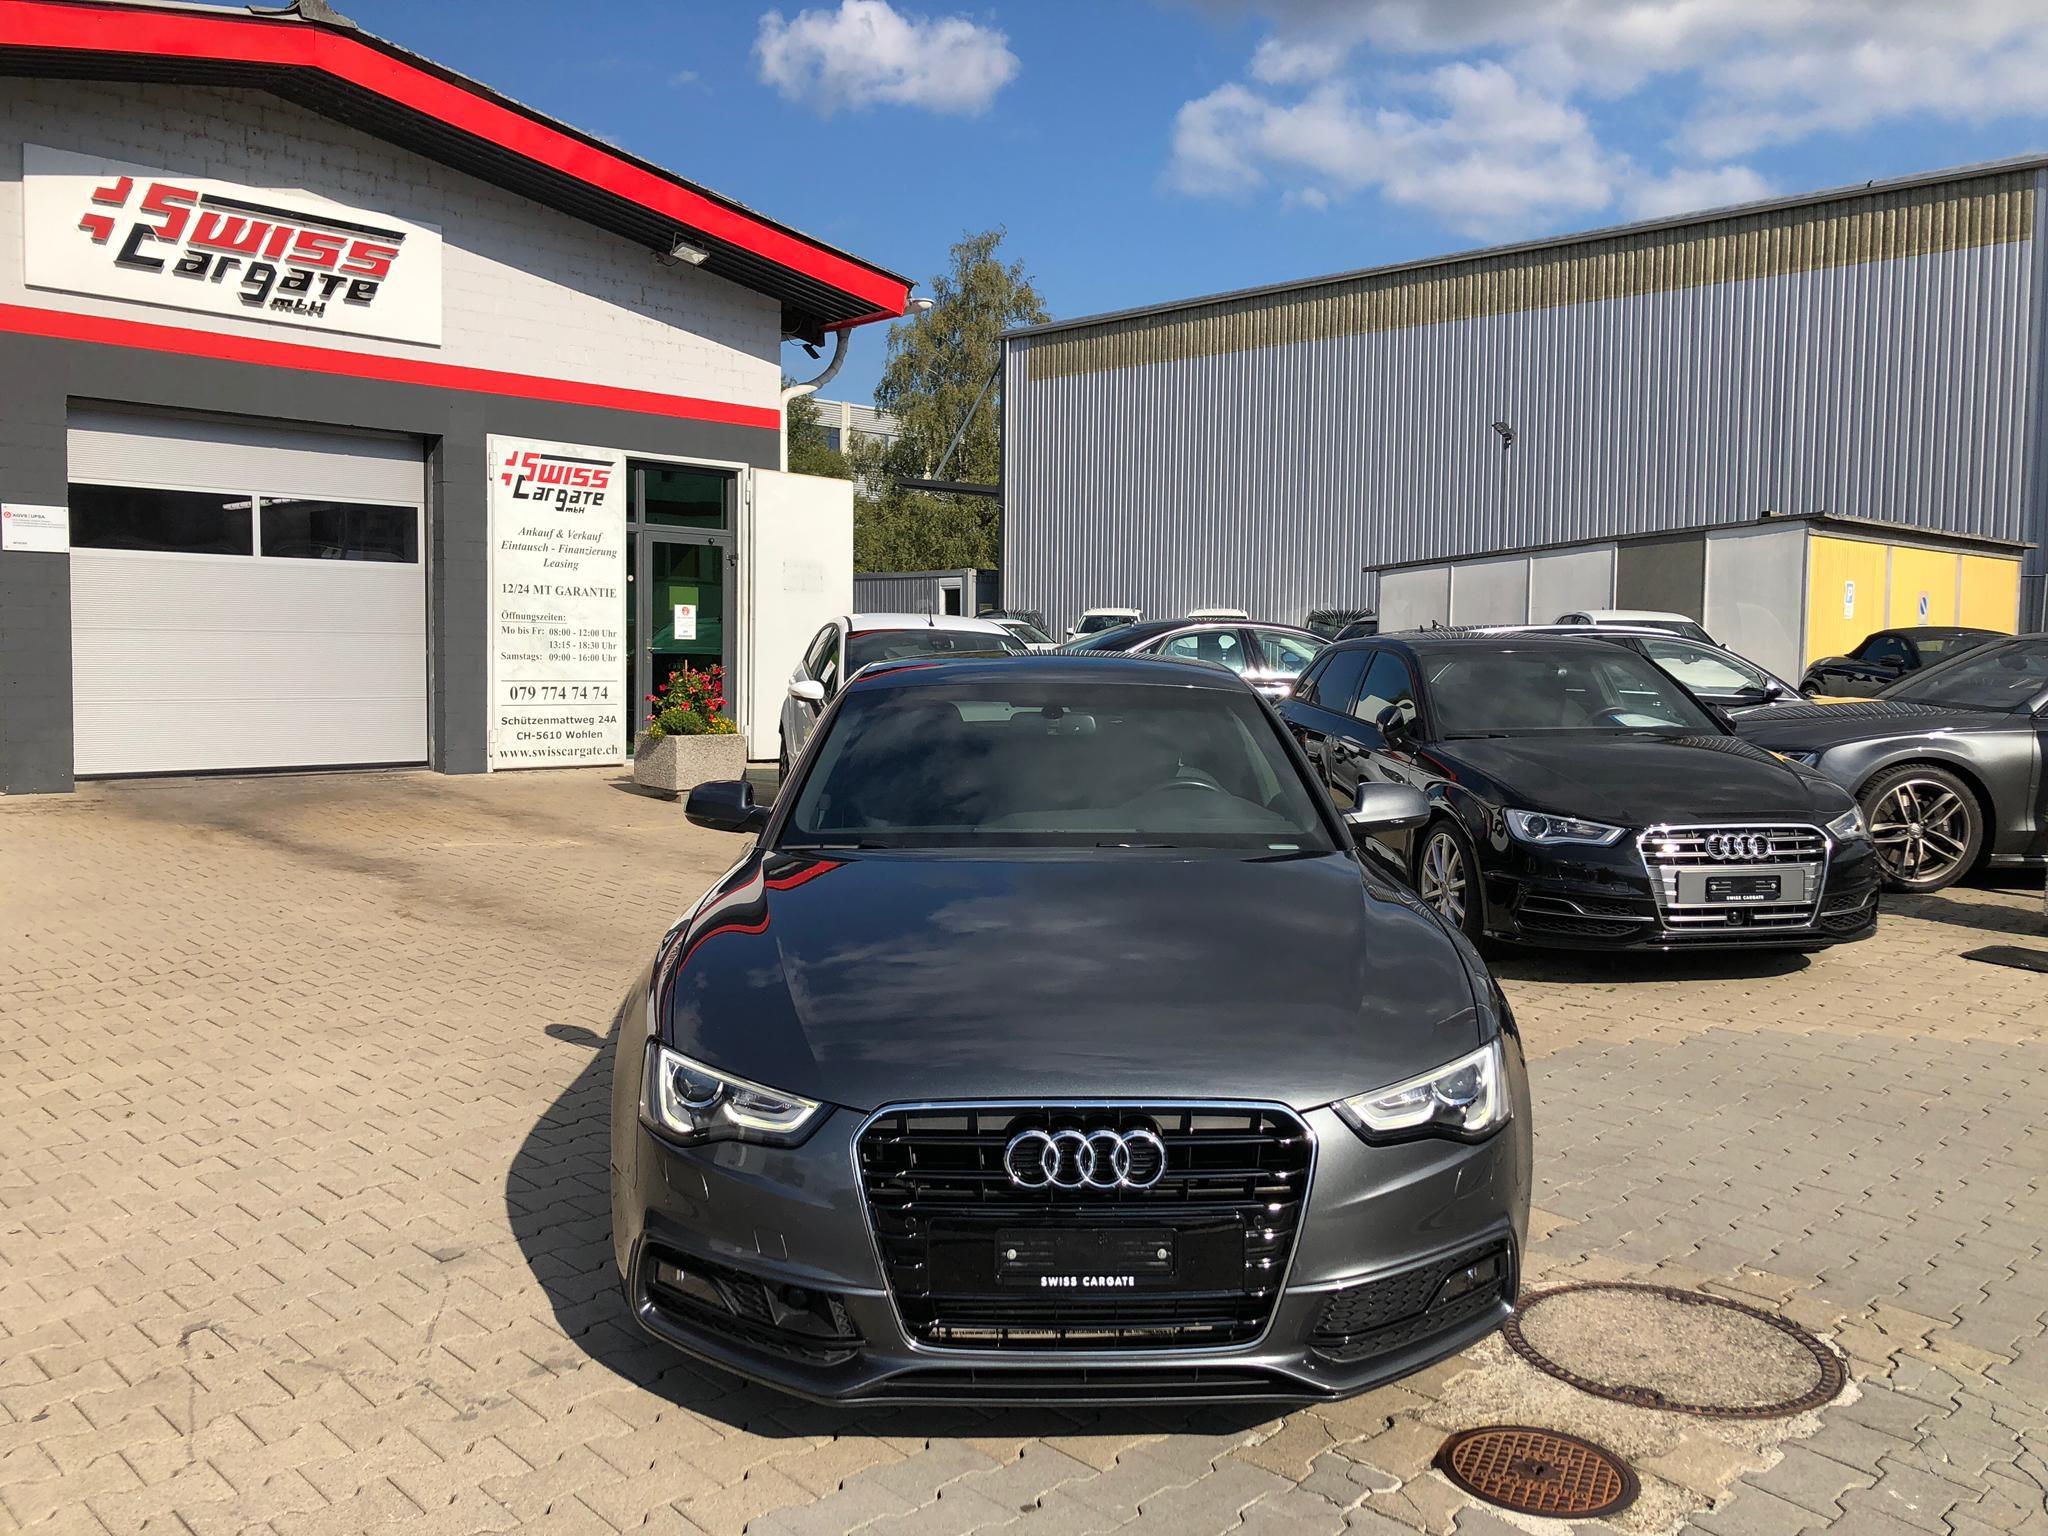 saloon Audi A5 Sportback 1.8 TFSI multitronic S Line 5 Plätze